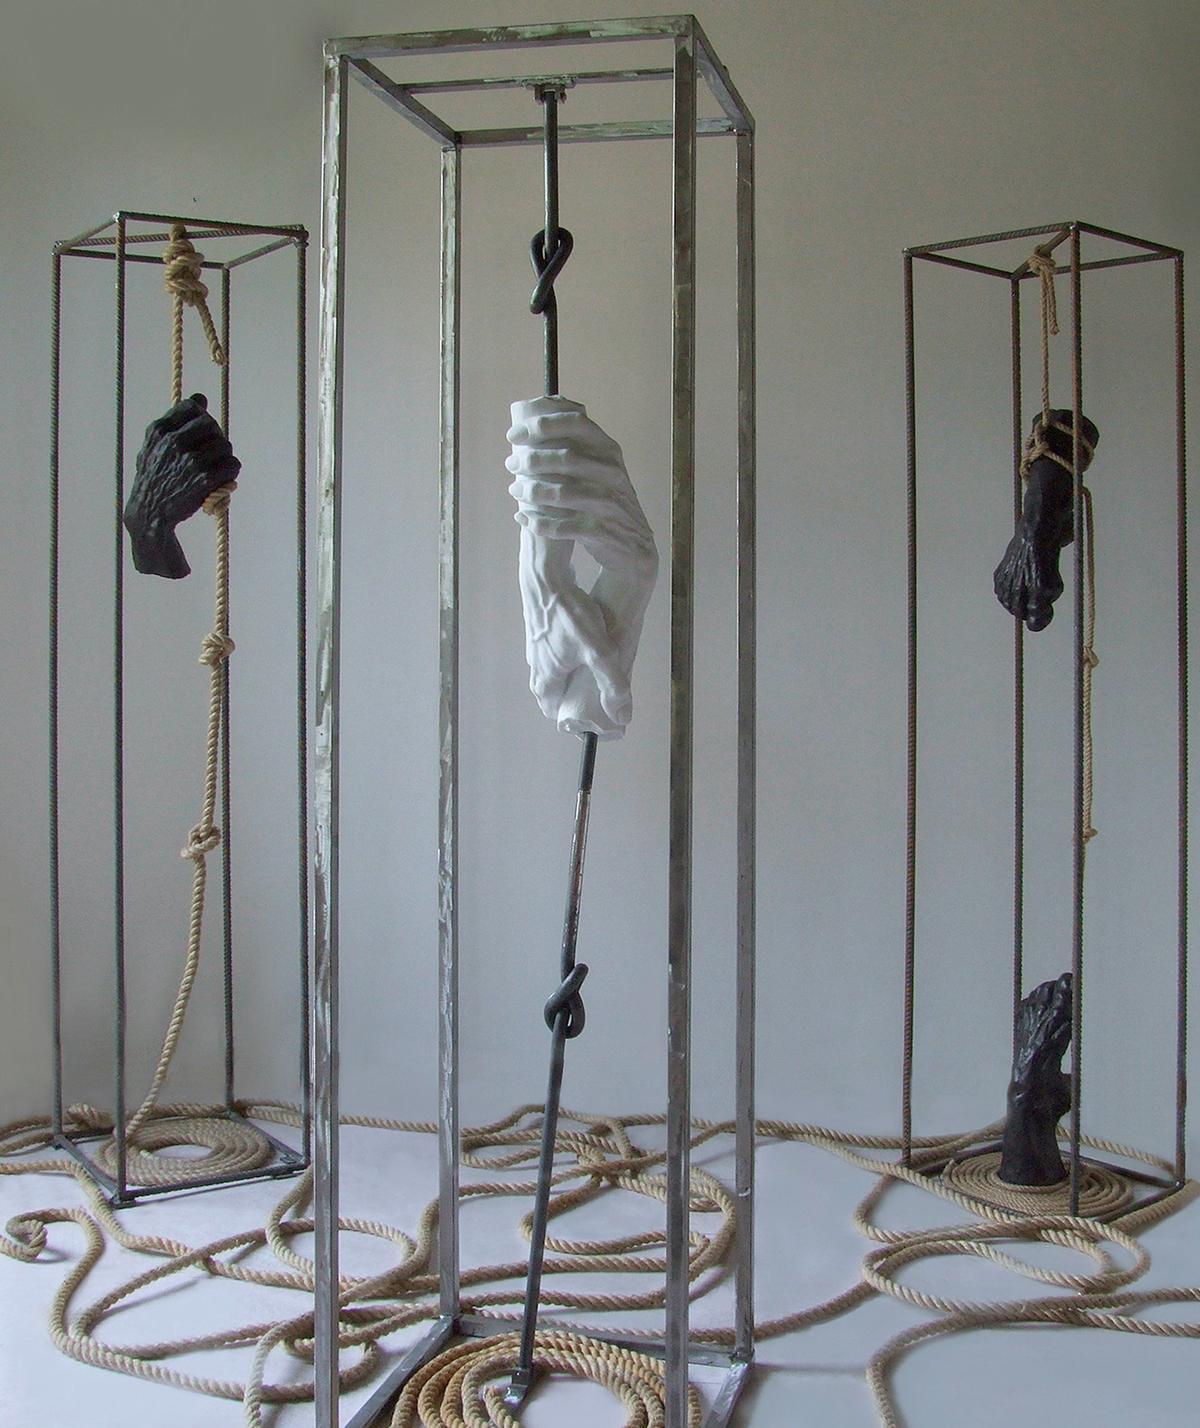 Elena-Mutinelli-6-etra-studio-tommasi